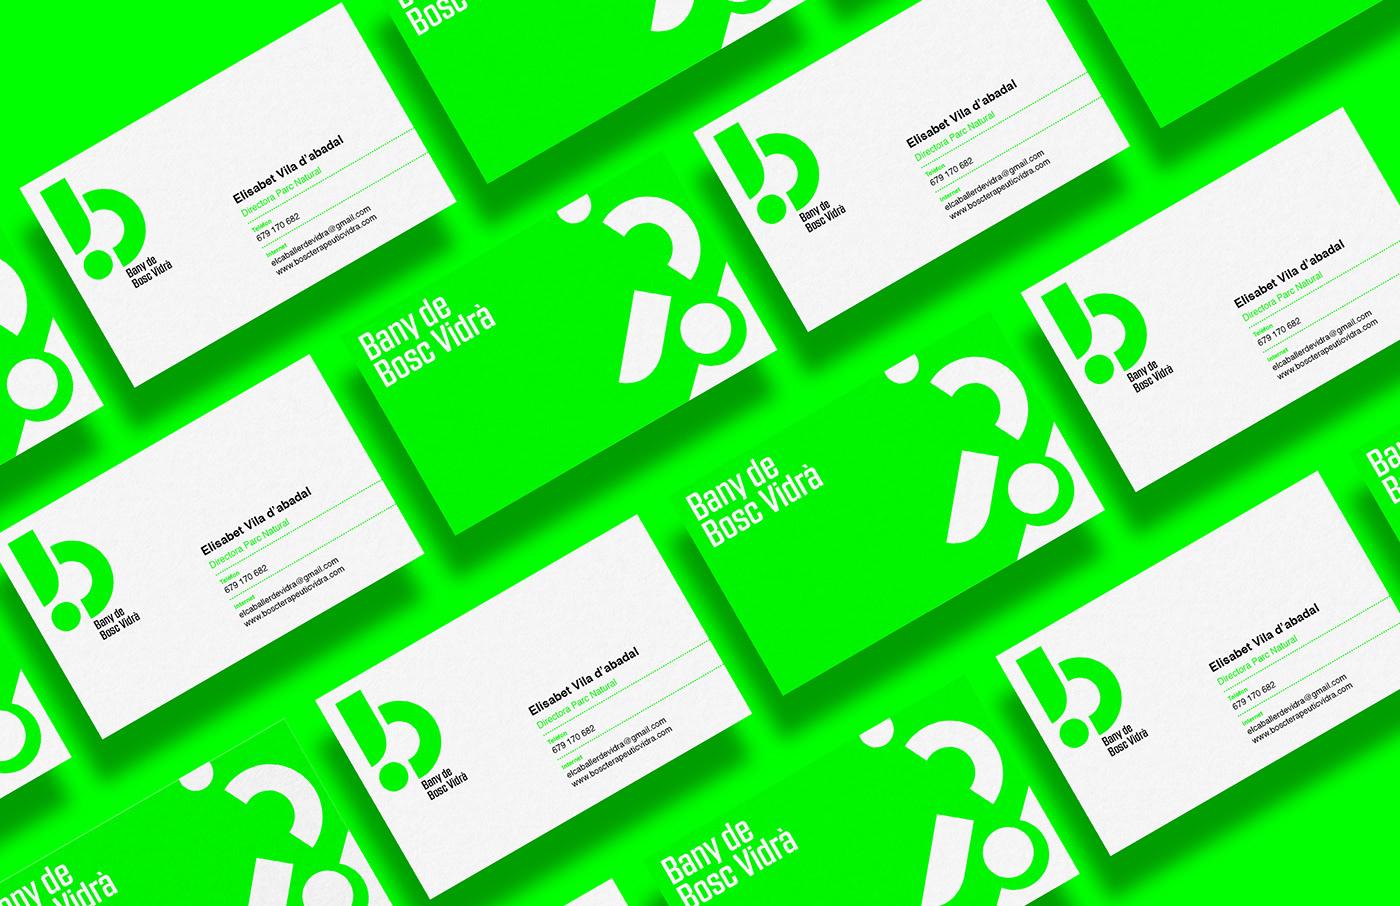 Behance brand logo brand identity graphic design  design Xavier Esclusa Trias posters Illustrator photoshop